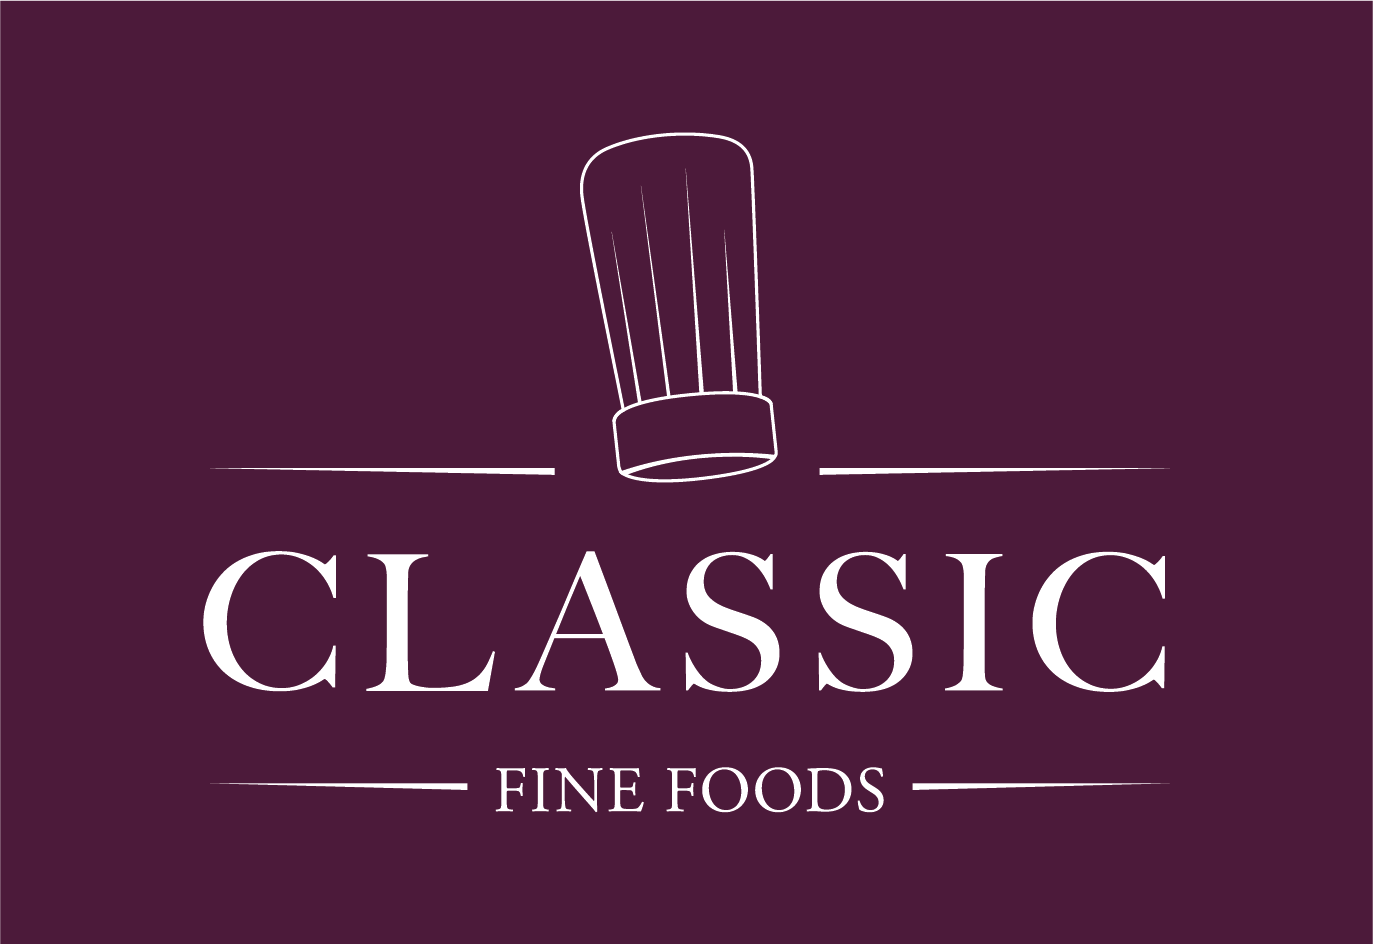 classicfinefoods